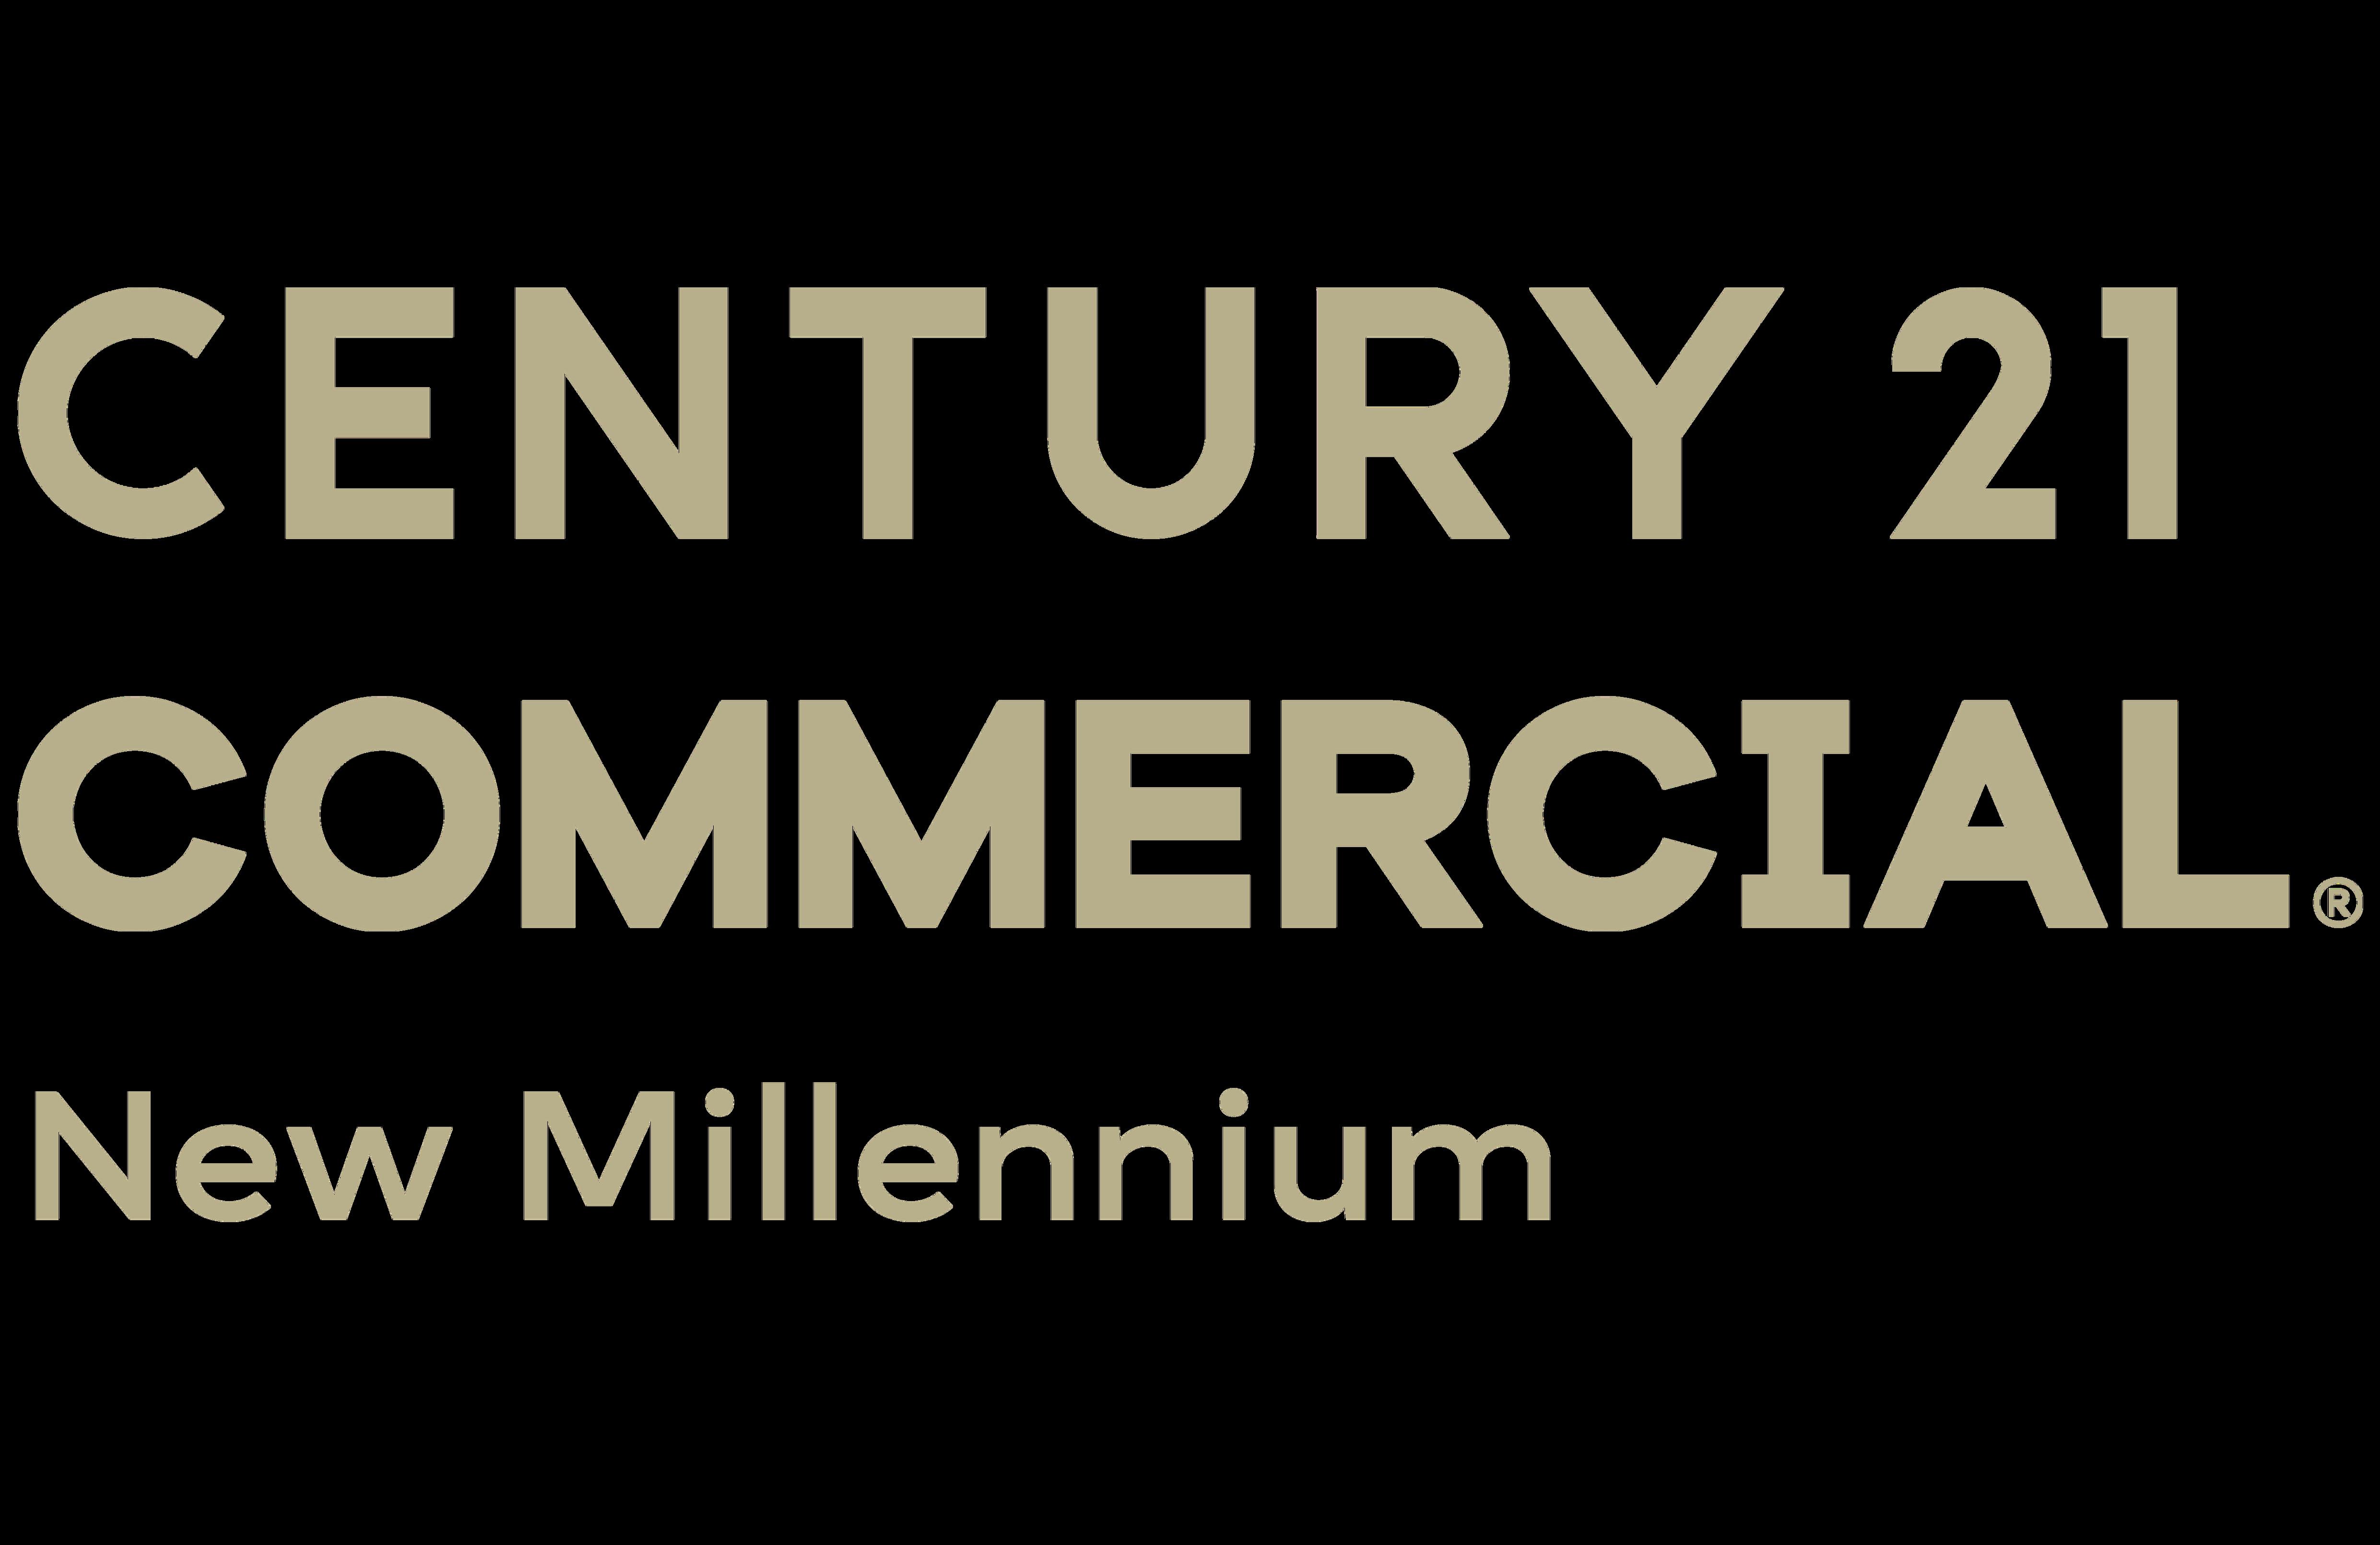 RealMarkets of CENTURY 21 New Millennium logo